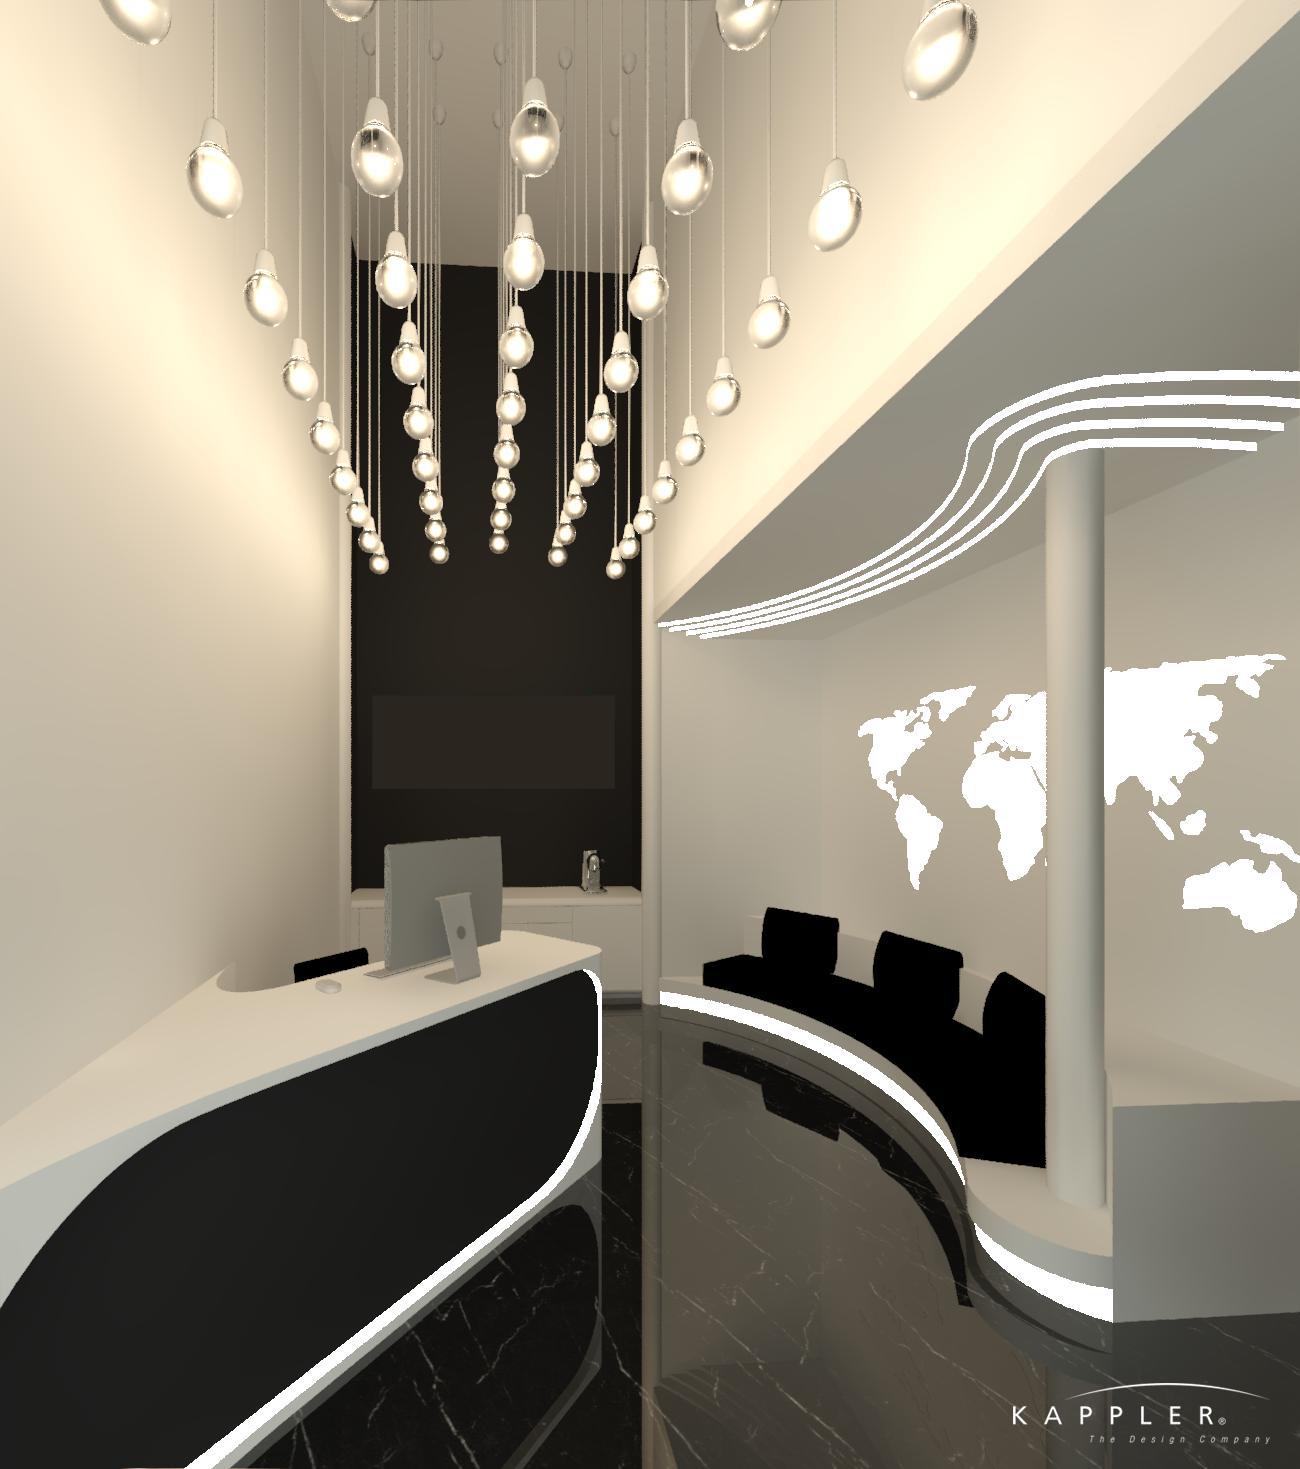 Washington Dental office design - minimalist and modern dental office reception area